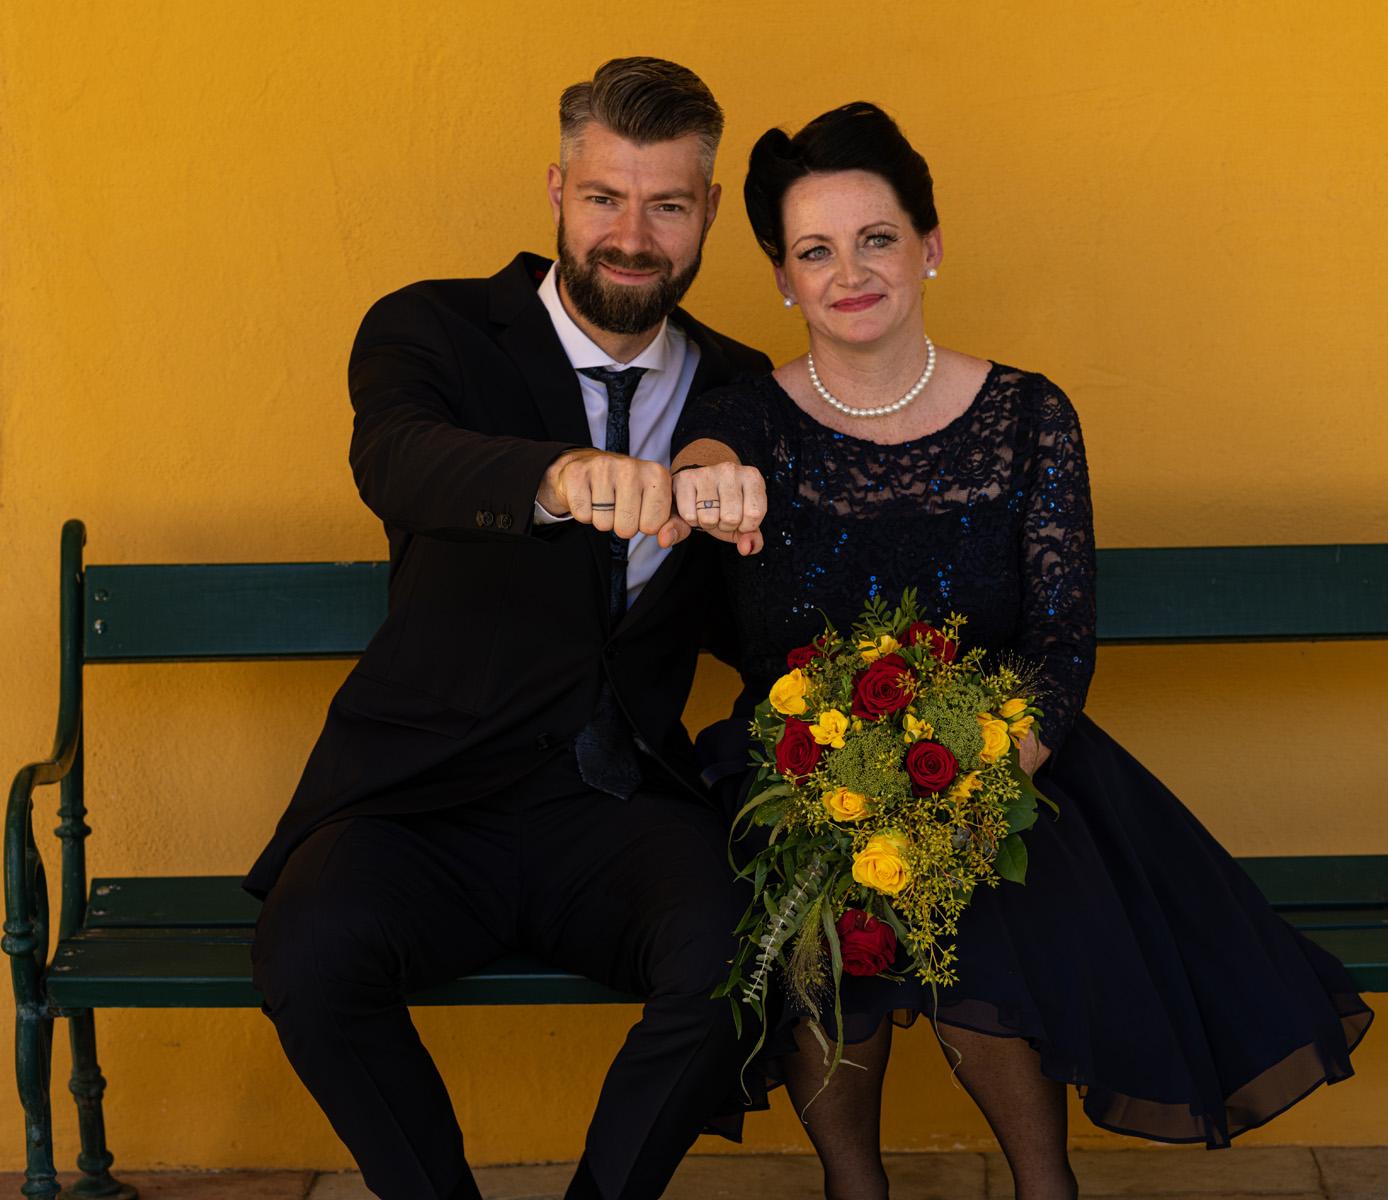 Barbara&Rene